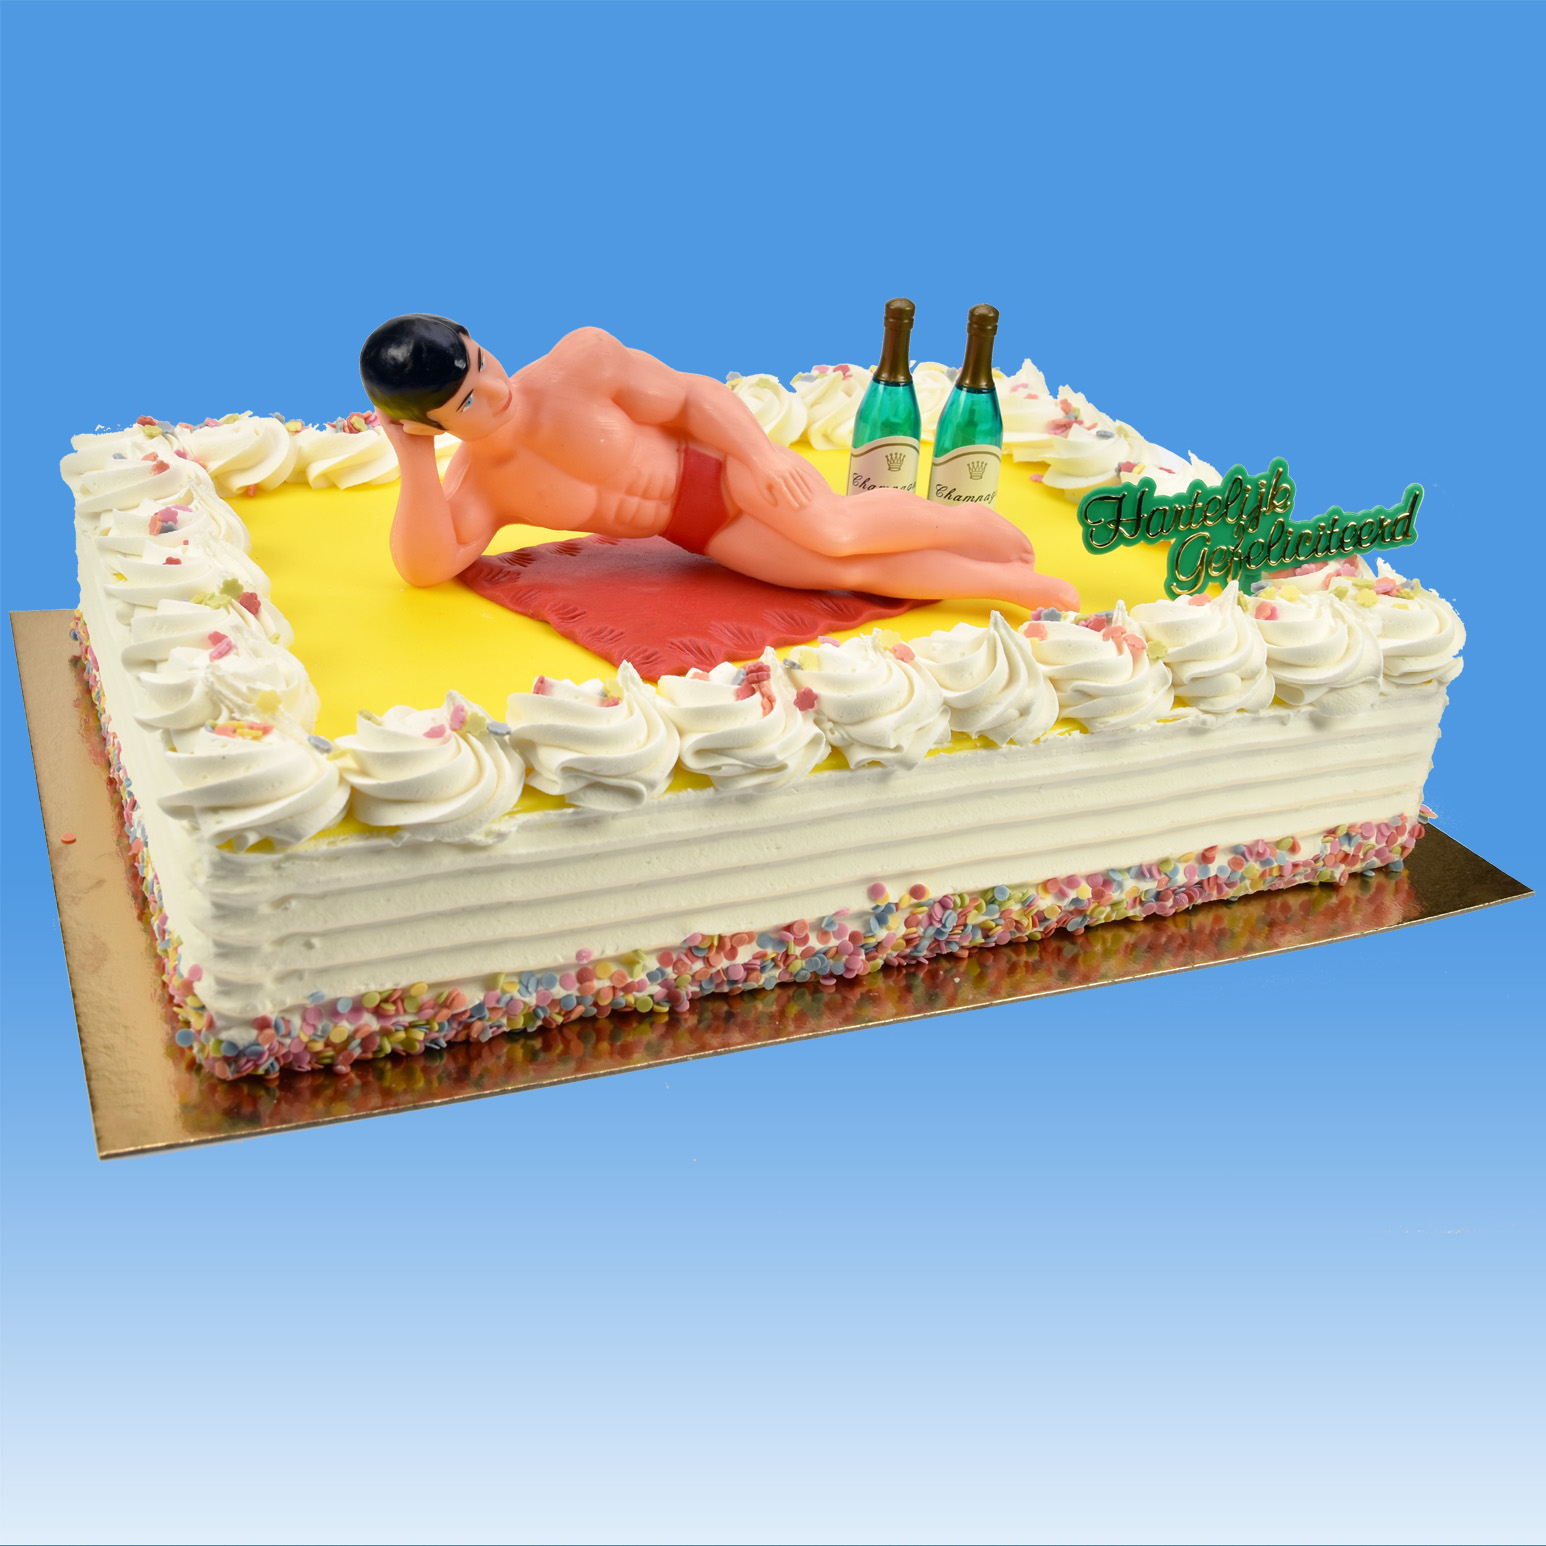 Prime Taartsetje Macho Man Online Bestellen Trend Decor Funny Birthday Cards Online Elaedamsfinfo